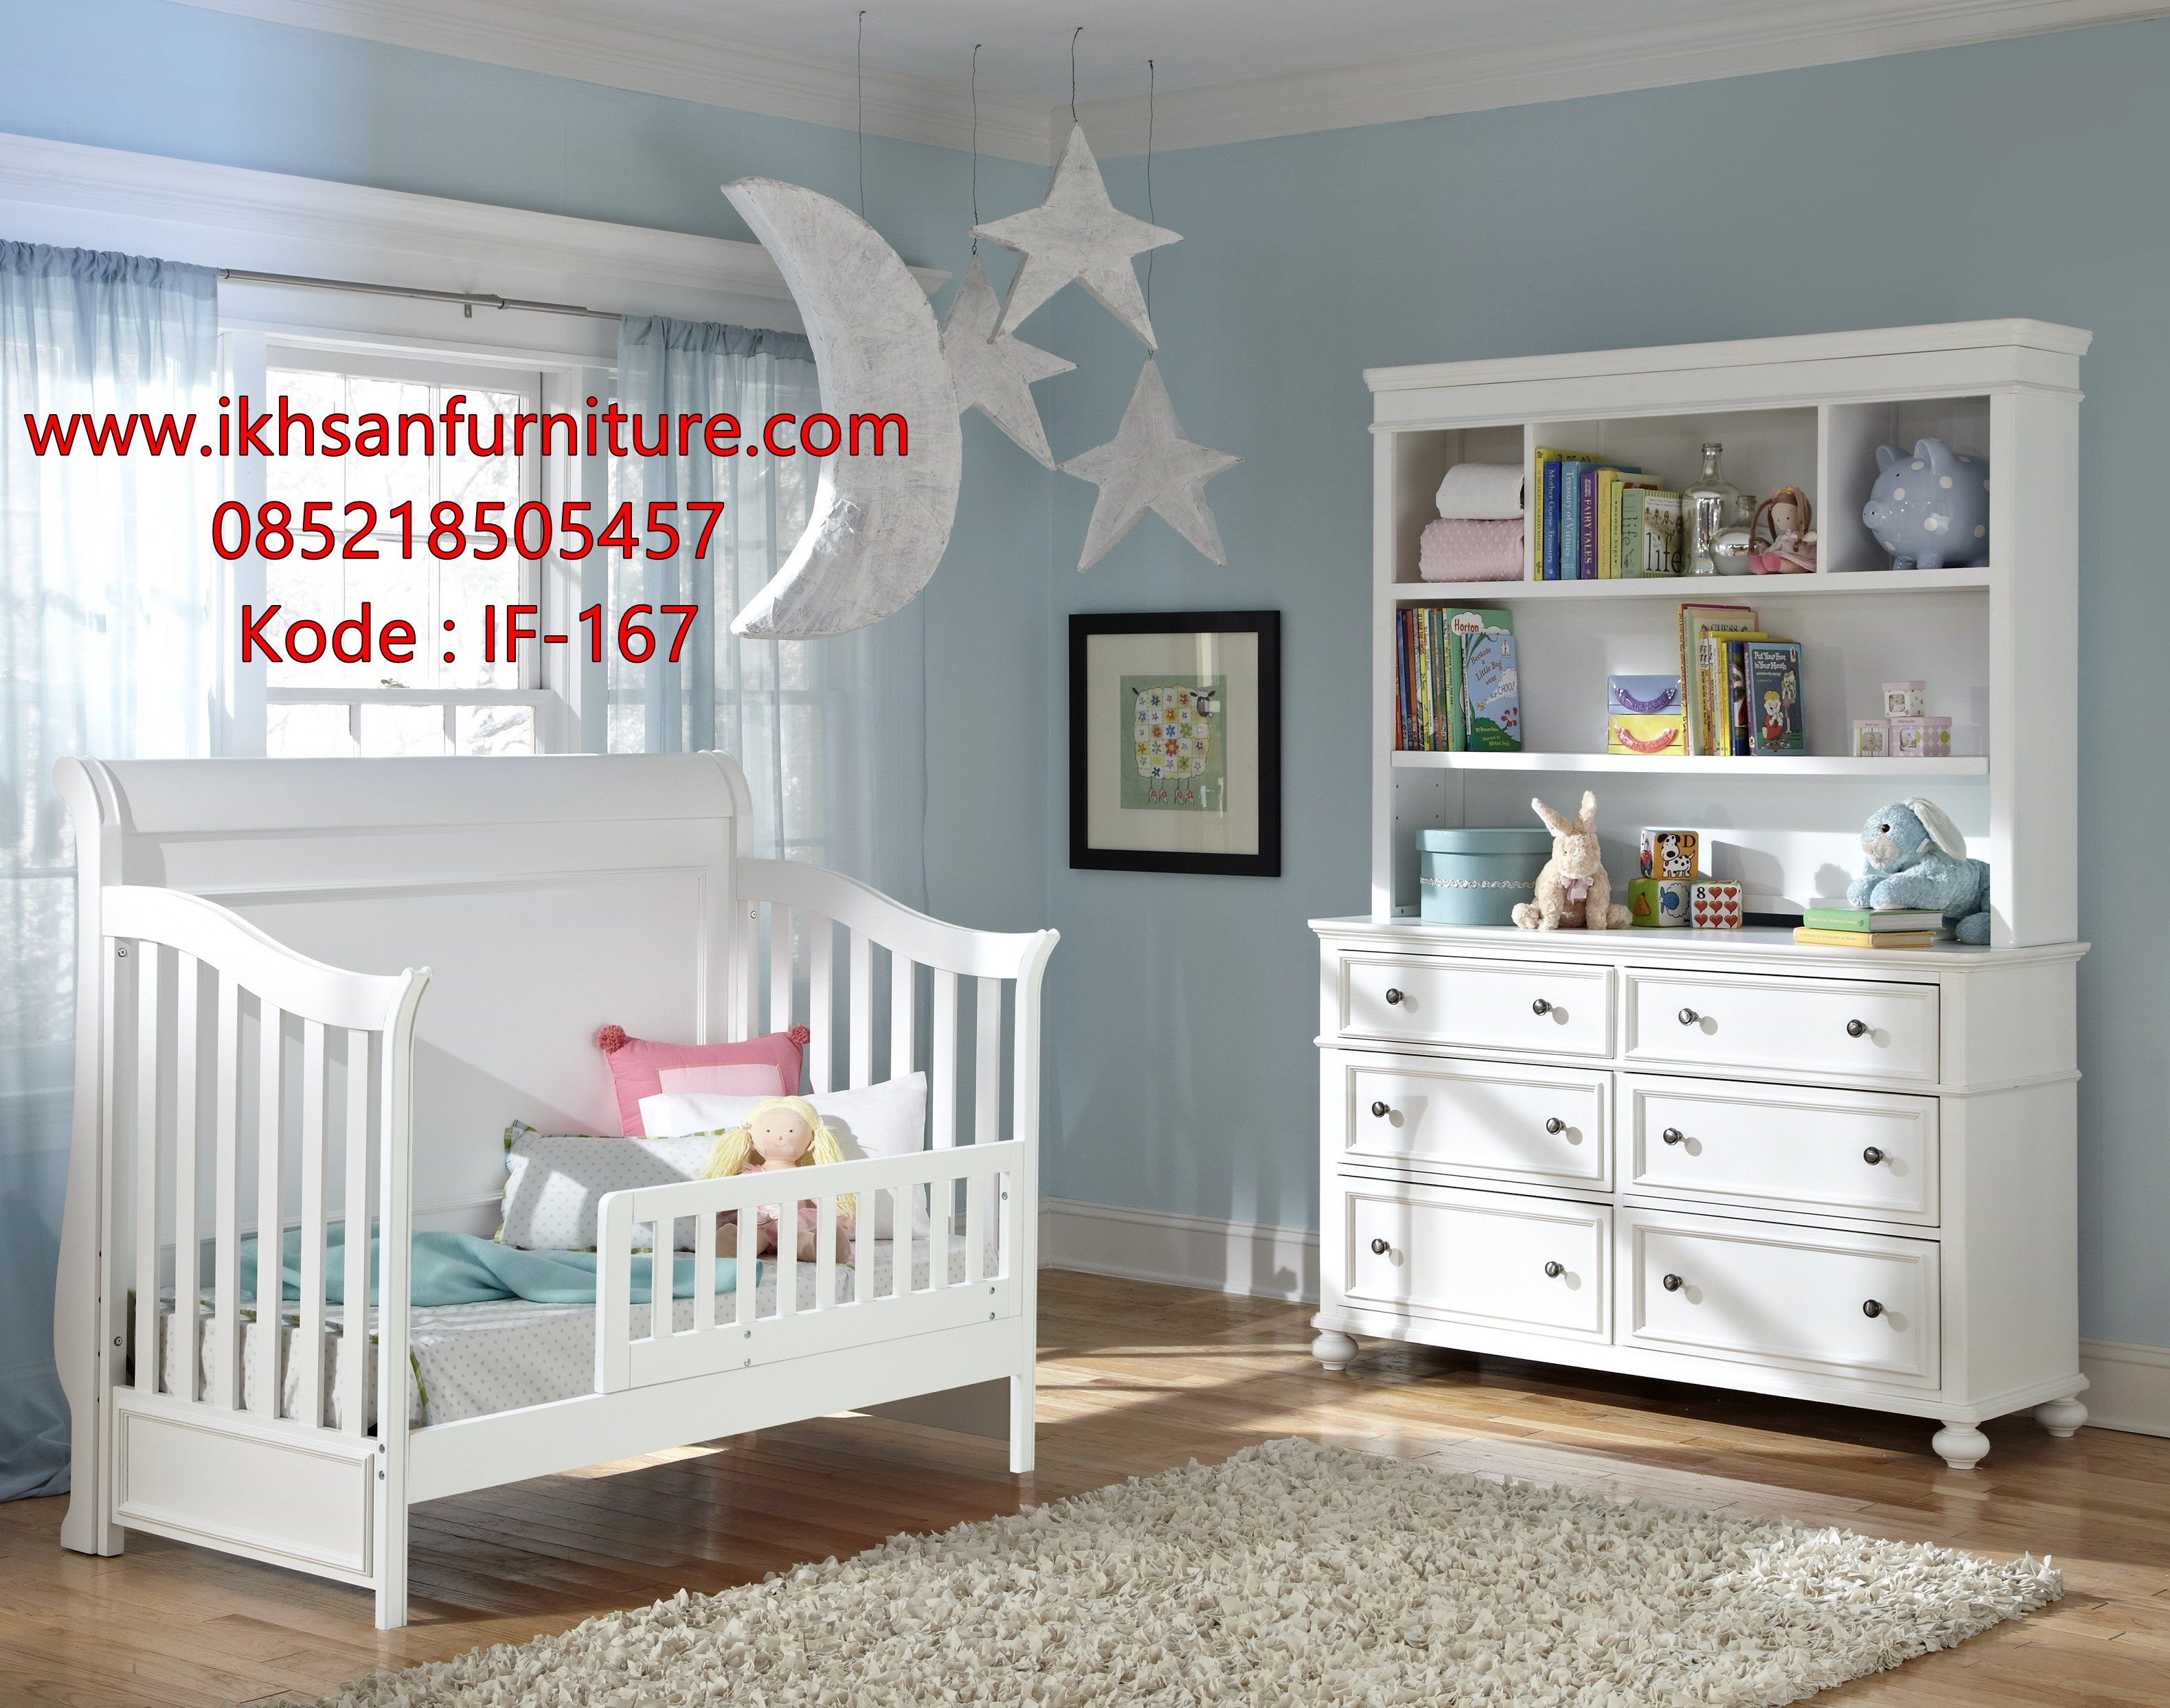 Jual Tempat Tidur Bayi Kayu Minimalis Modern Tempat Tidur Bayi